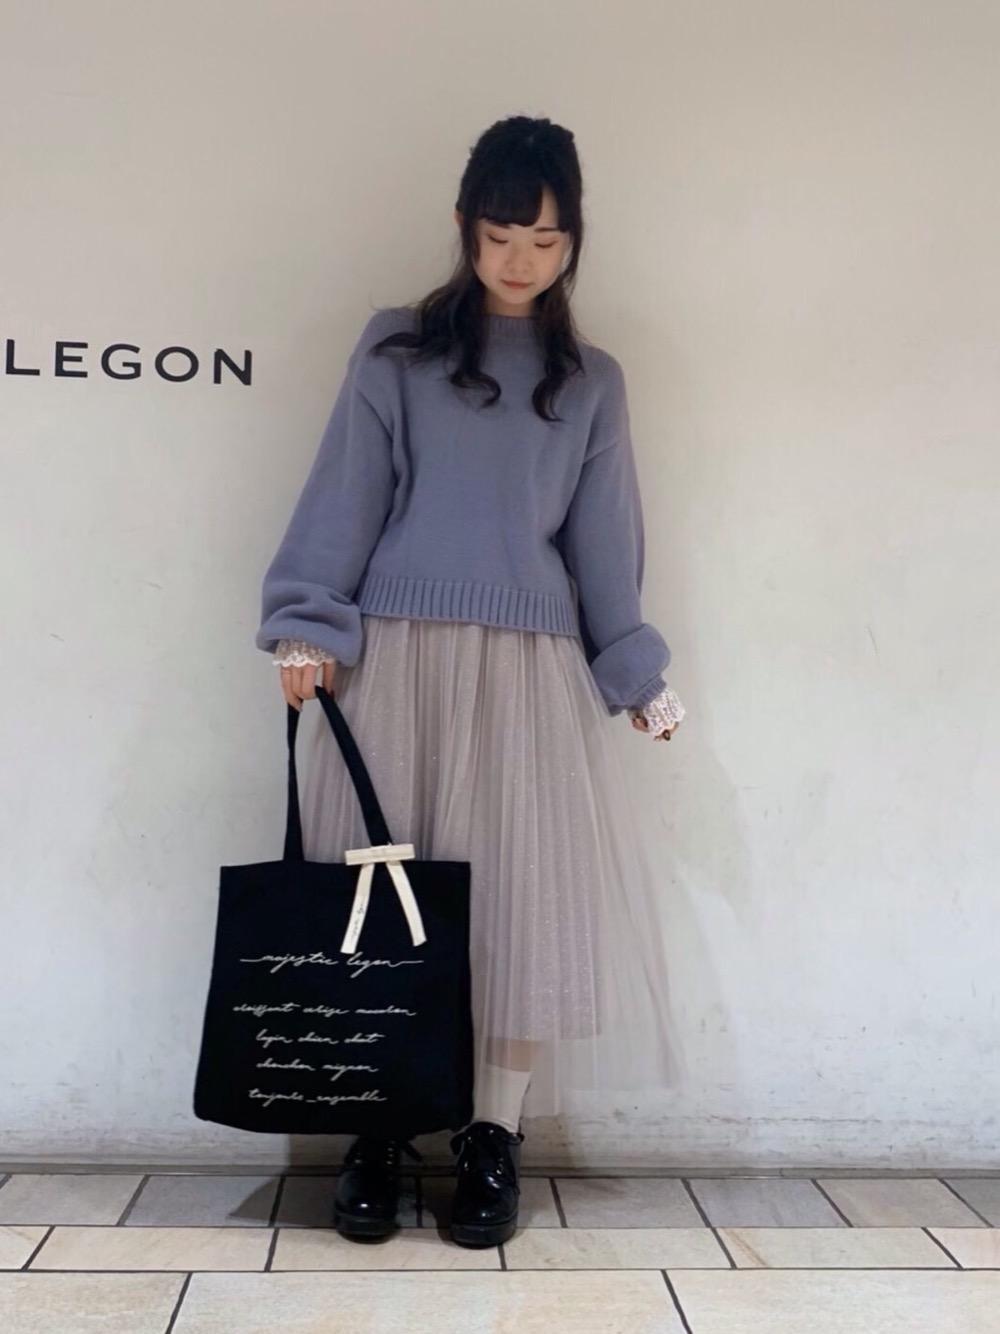 MAJESTIC LEGONアトレ吉祥寺店